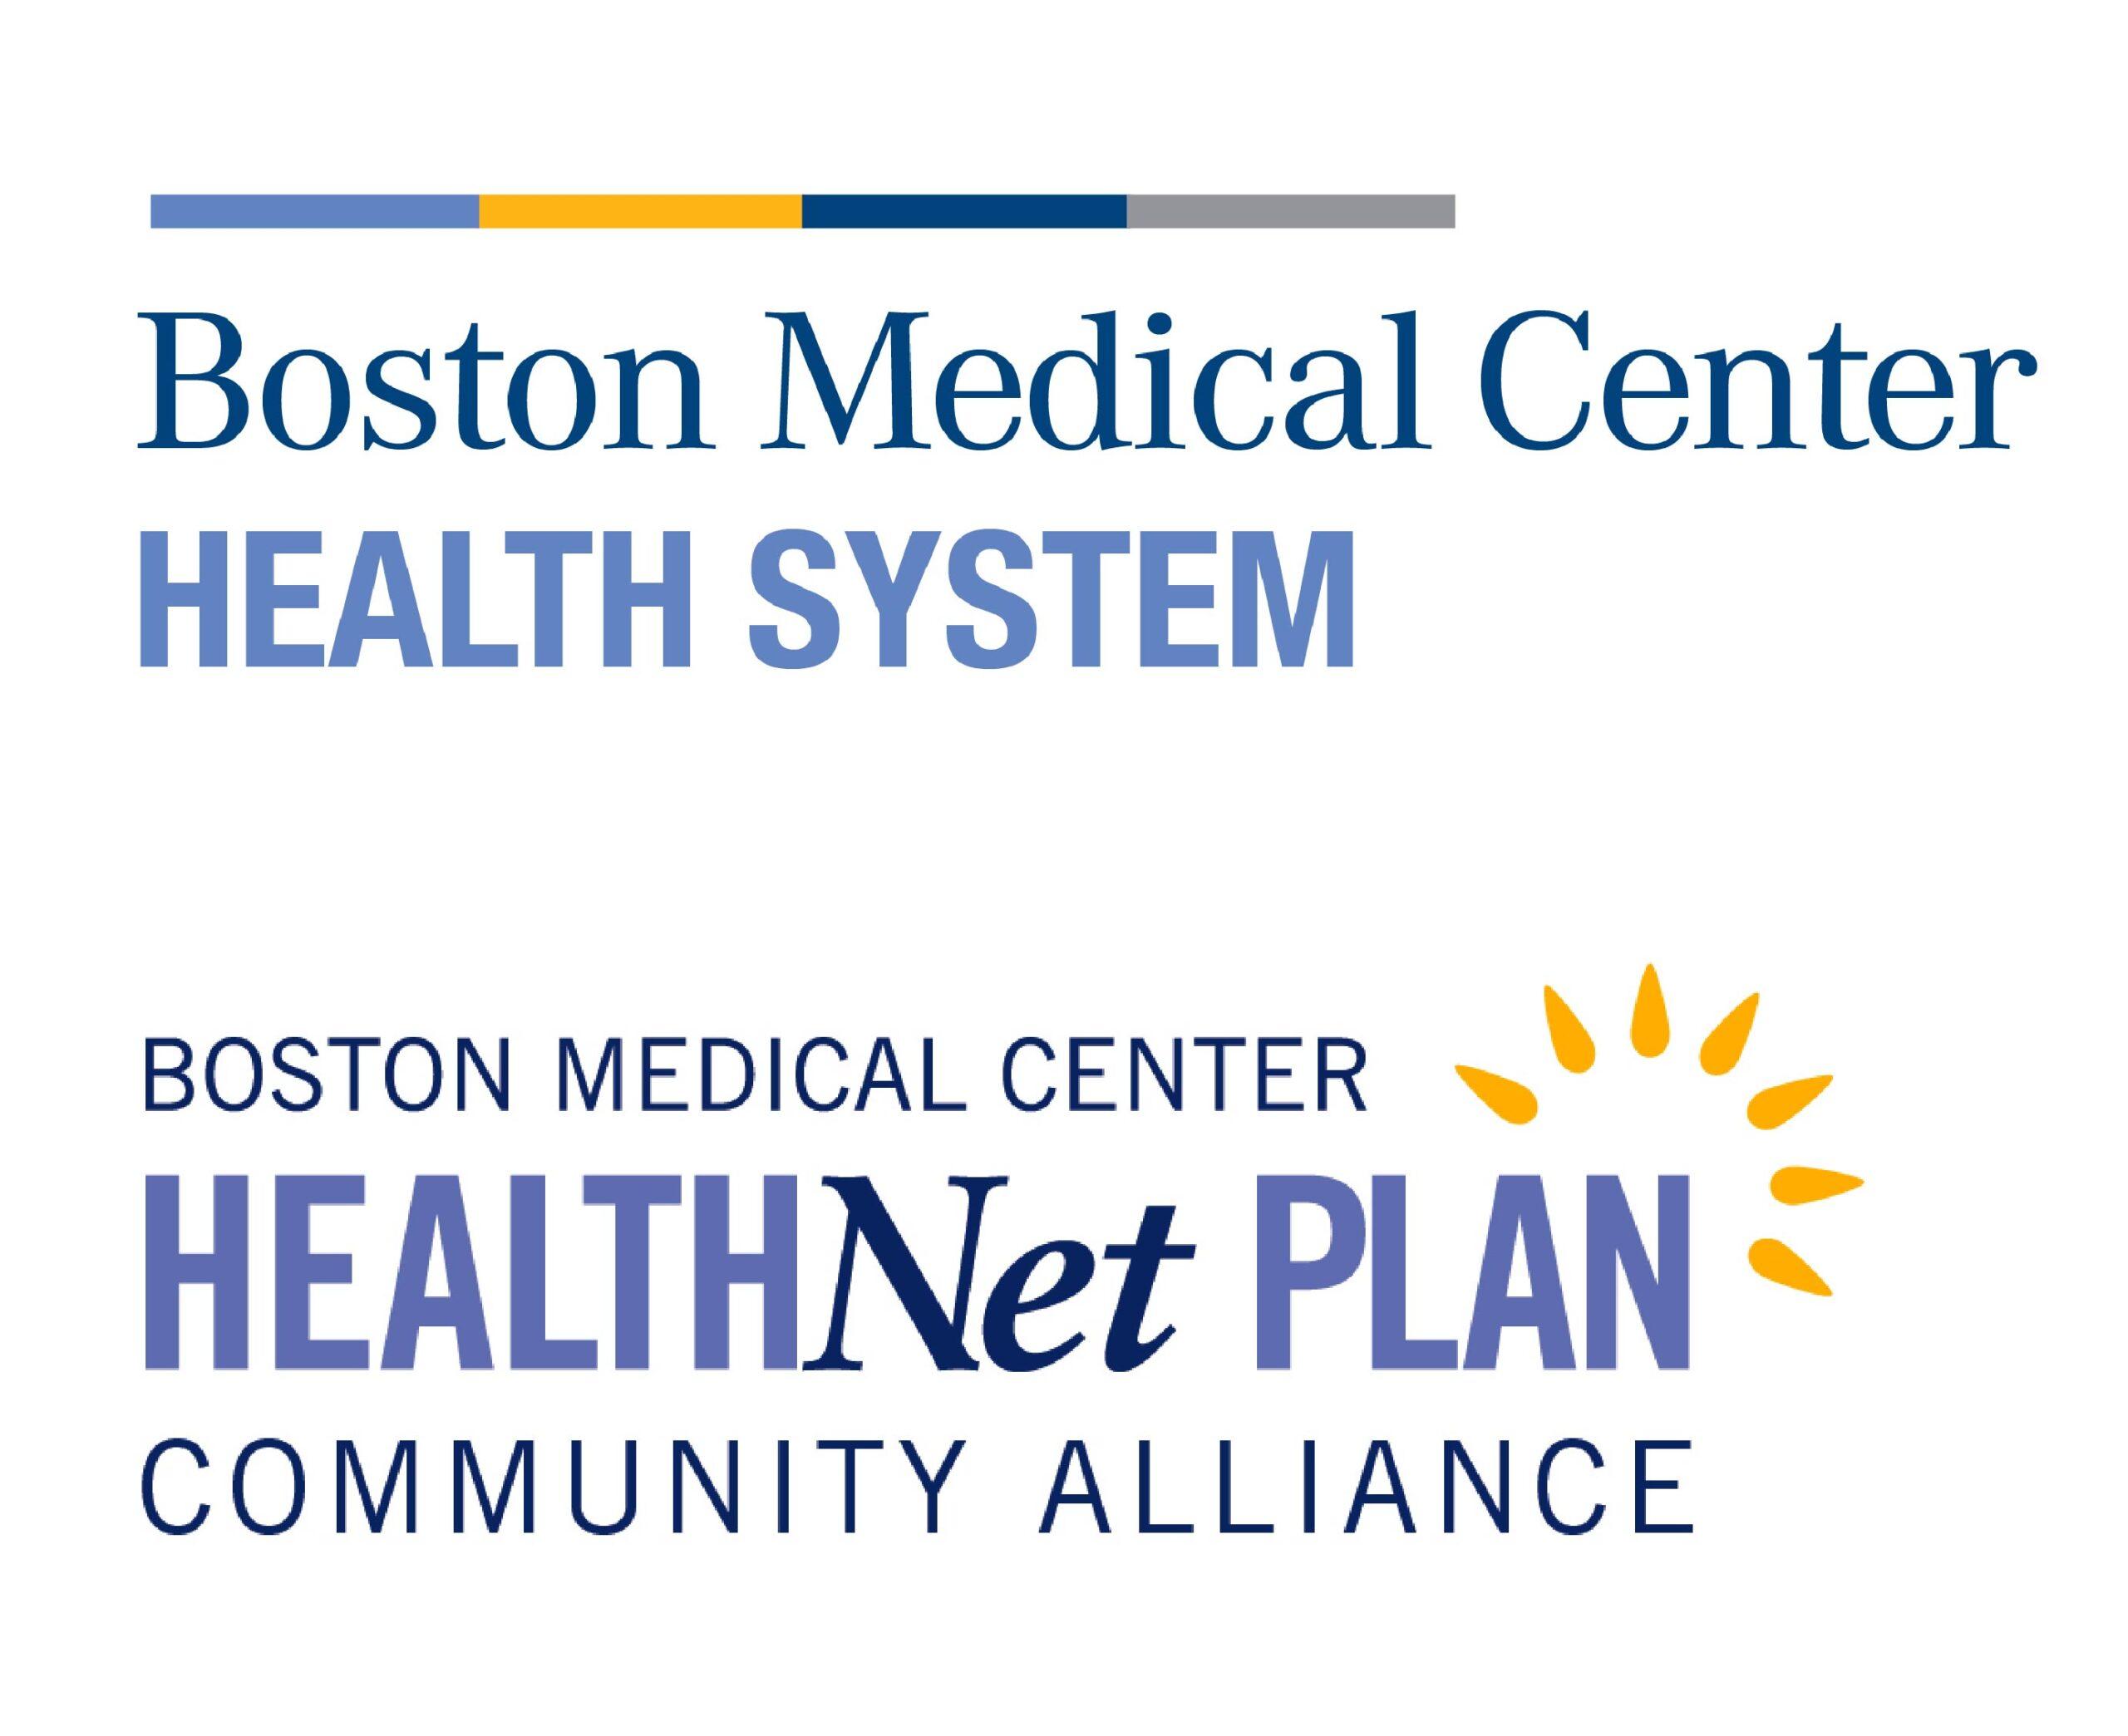 BMC and BMC HealthNet Plan